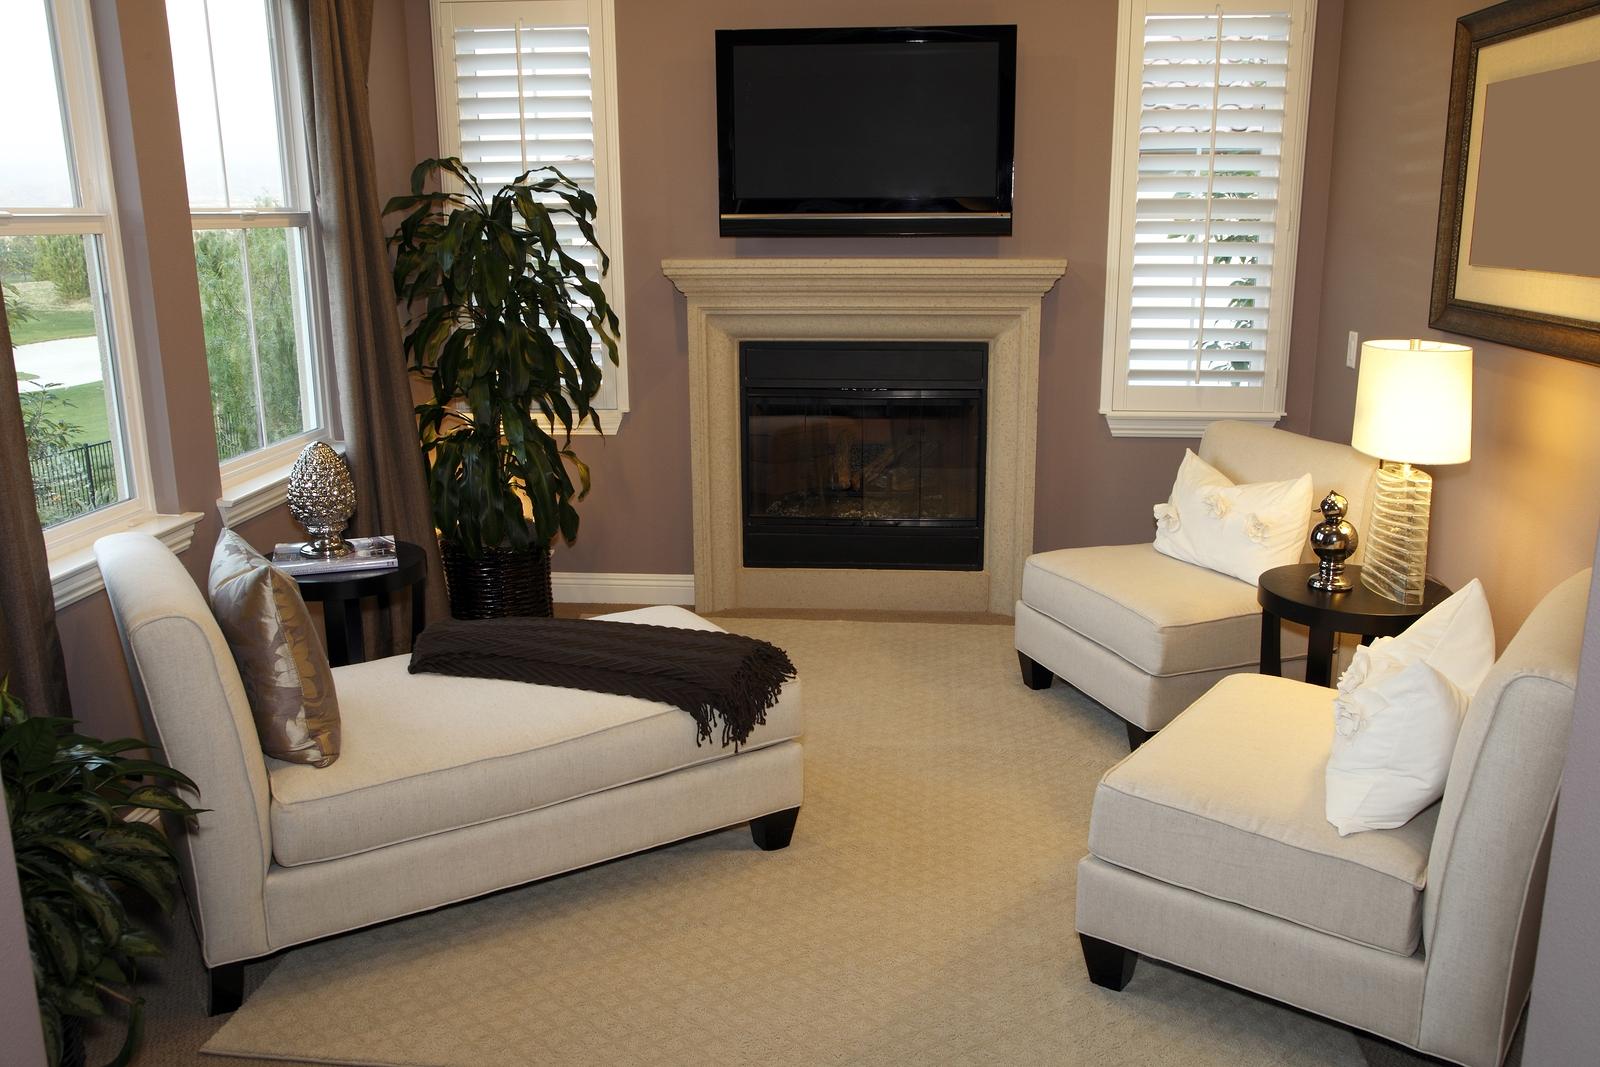 bigstock-Luxury-home-living-room-6581653